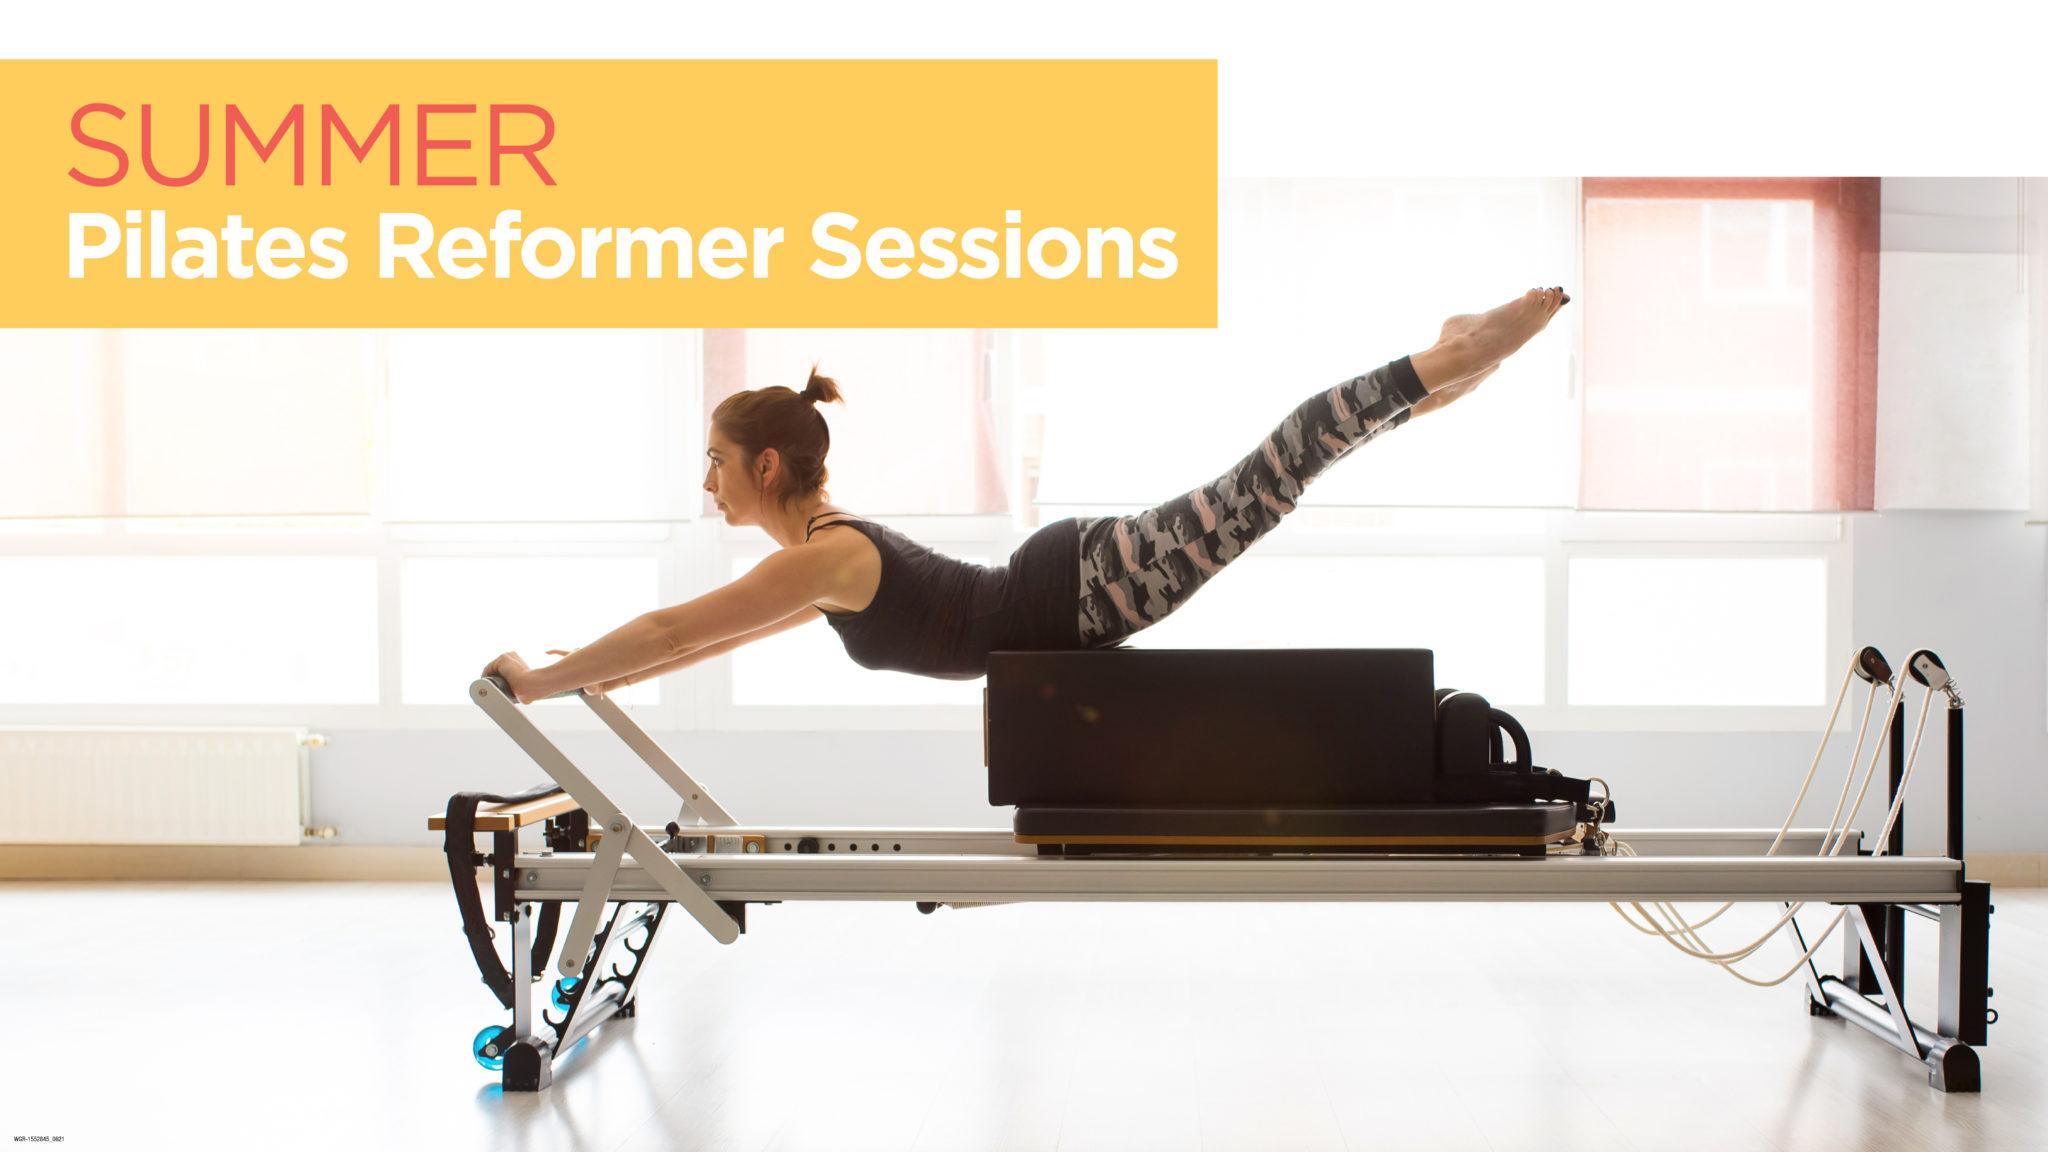 Summer Pilates Reformer Sessions